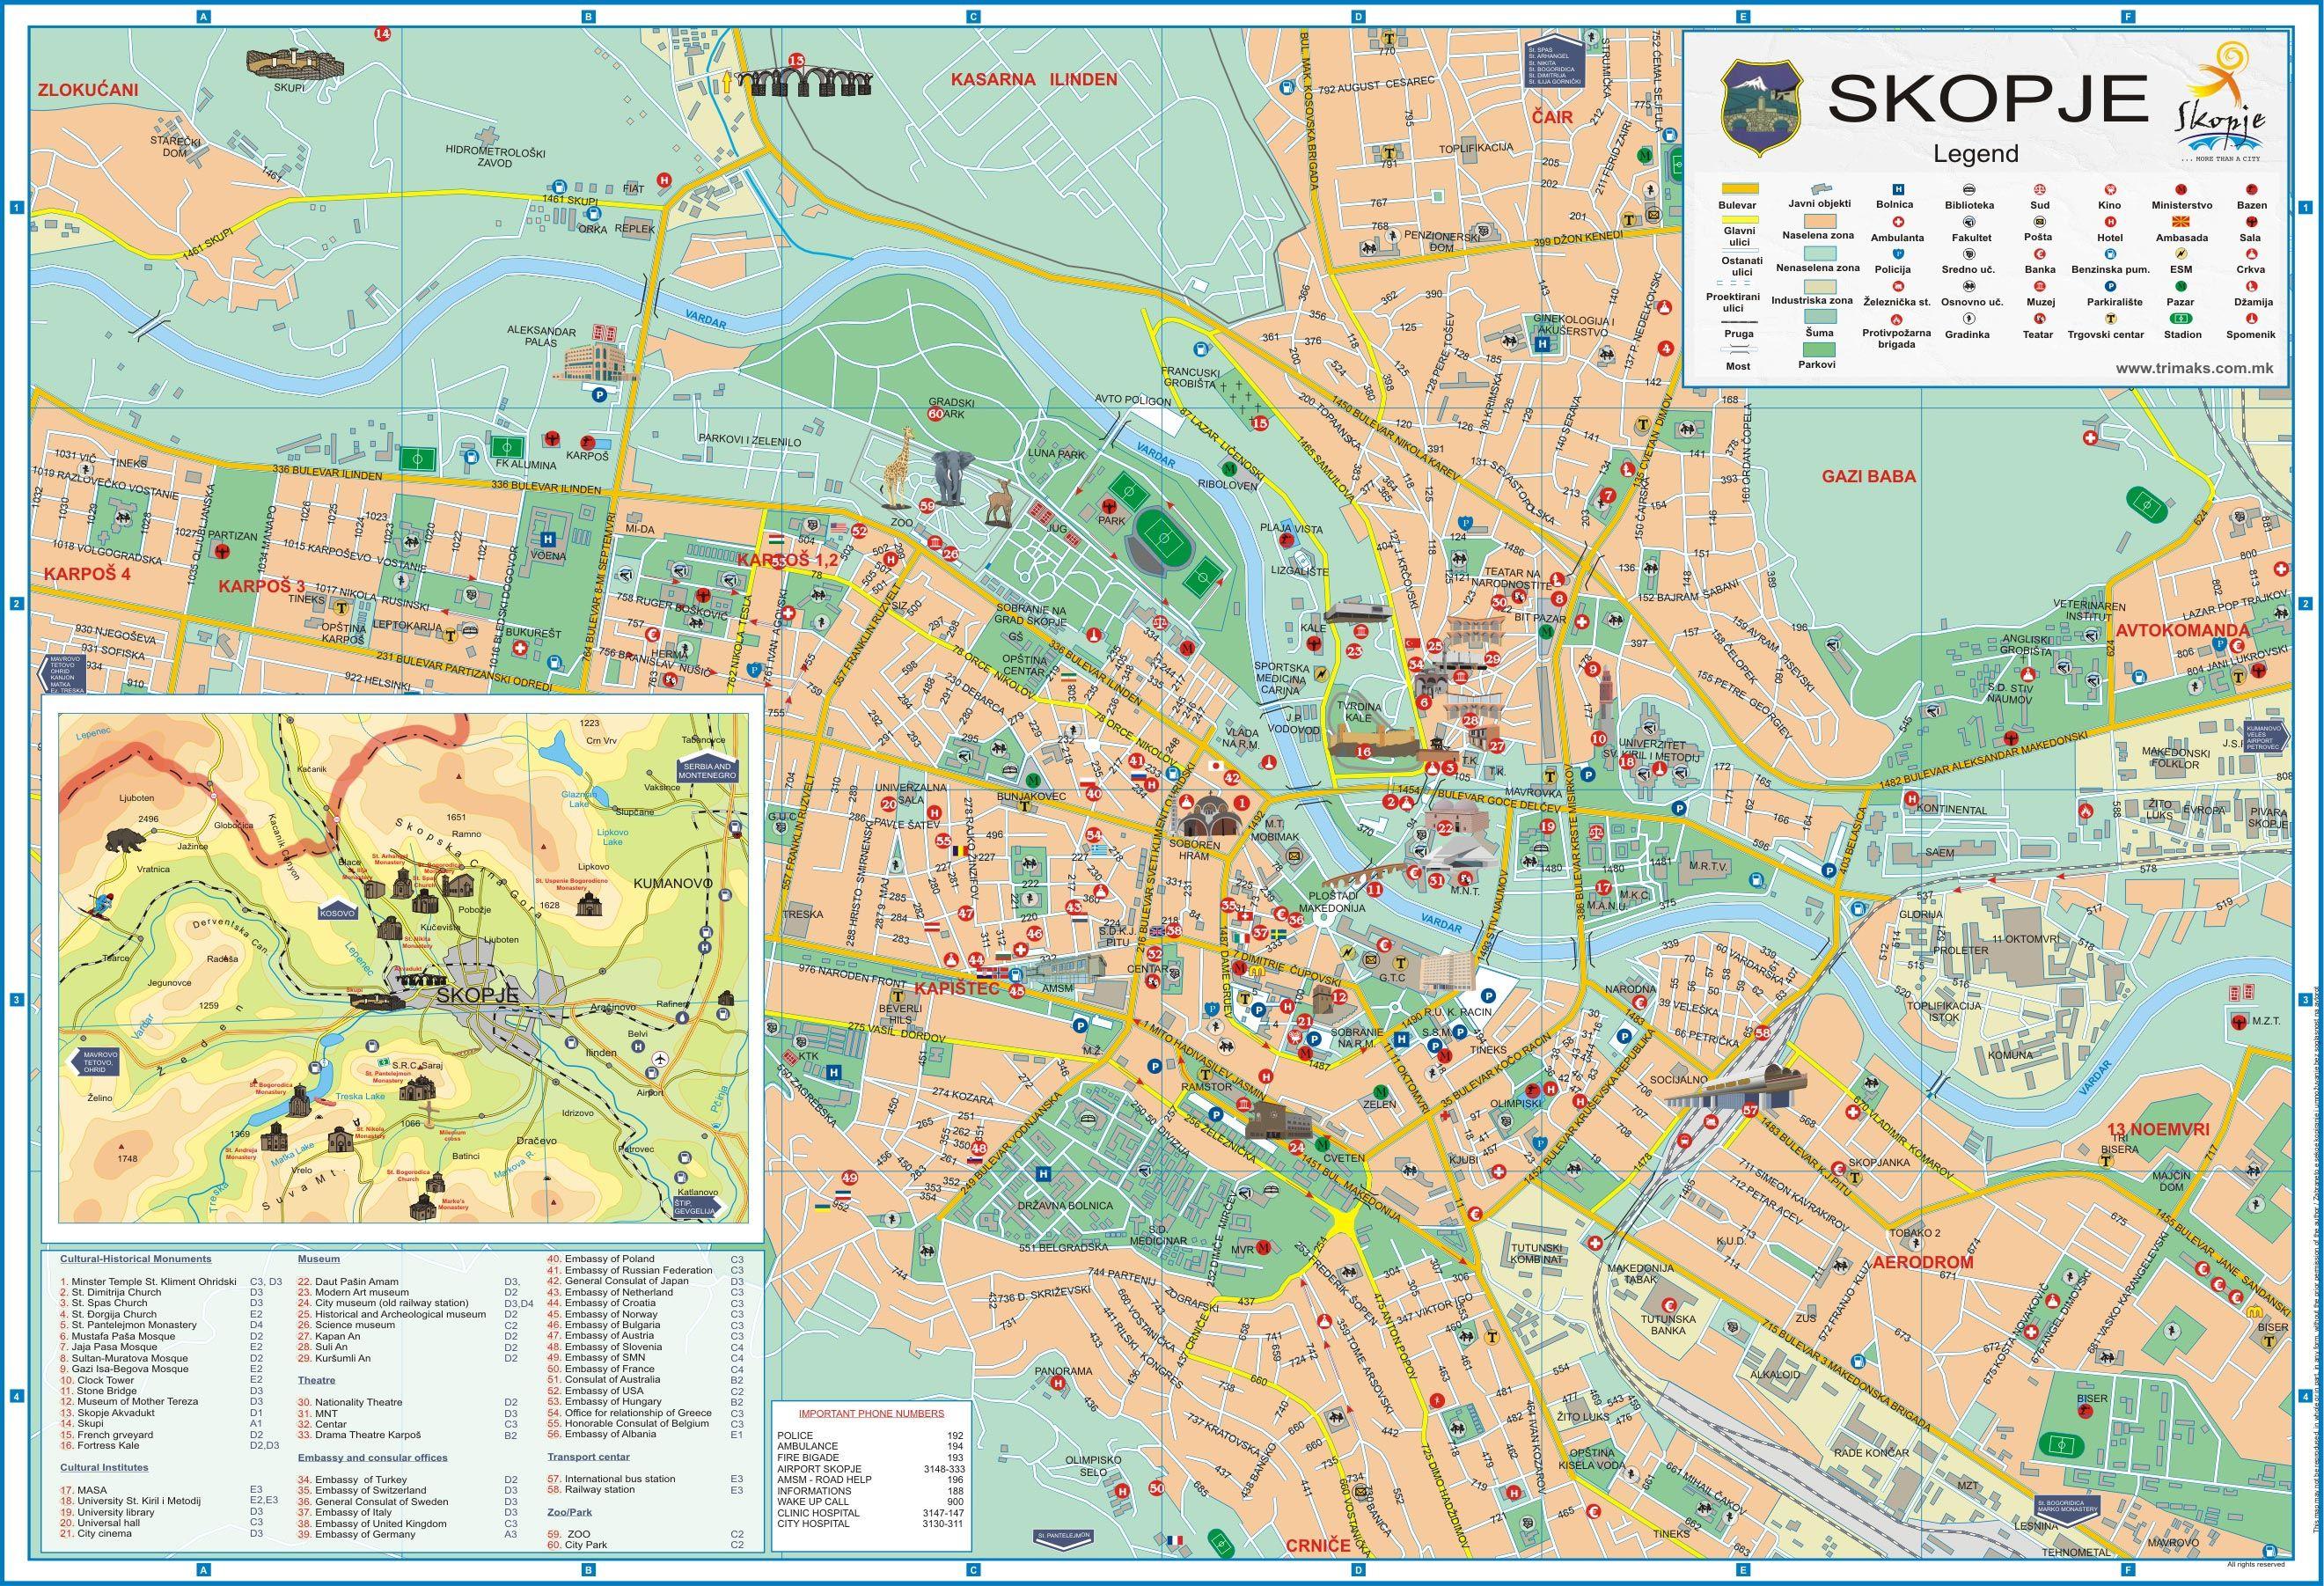 Skopje macedonia maps pinterest macedonia and city gumiabroncs Image collections